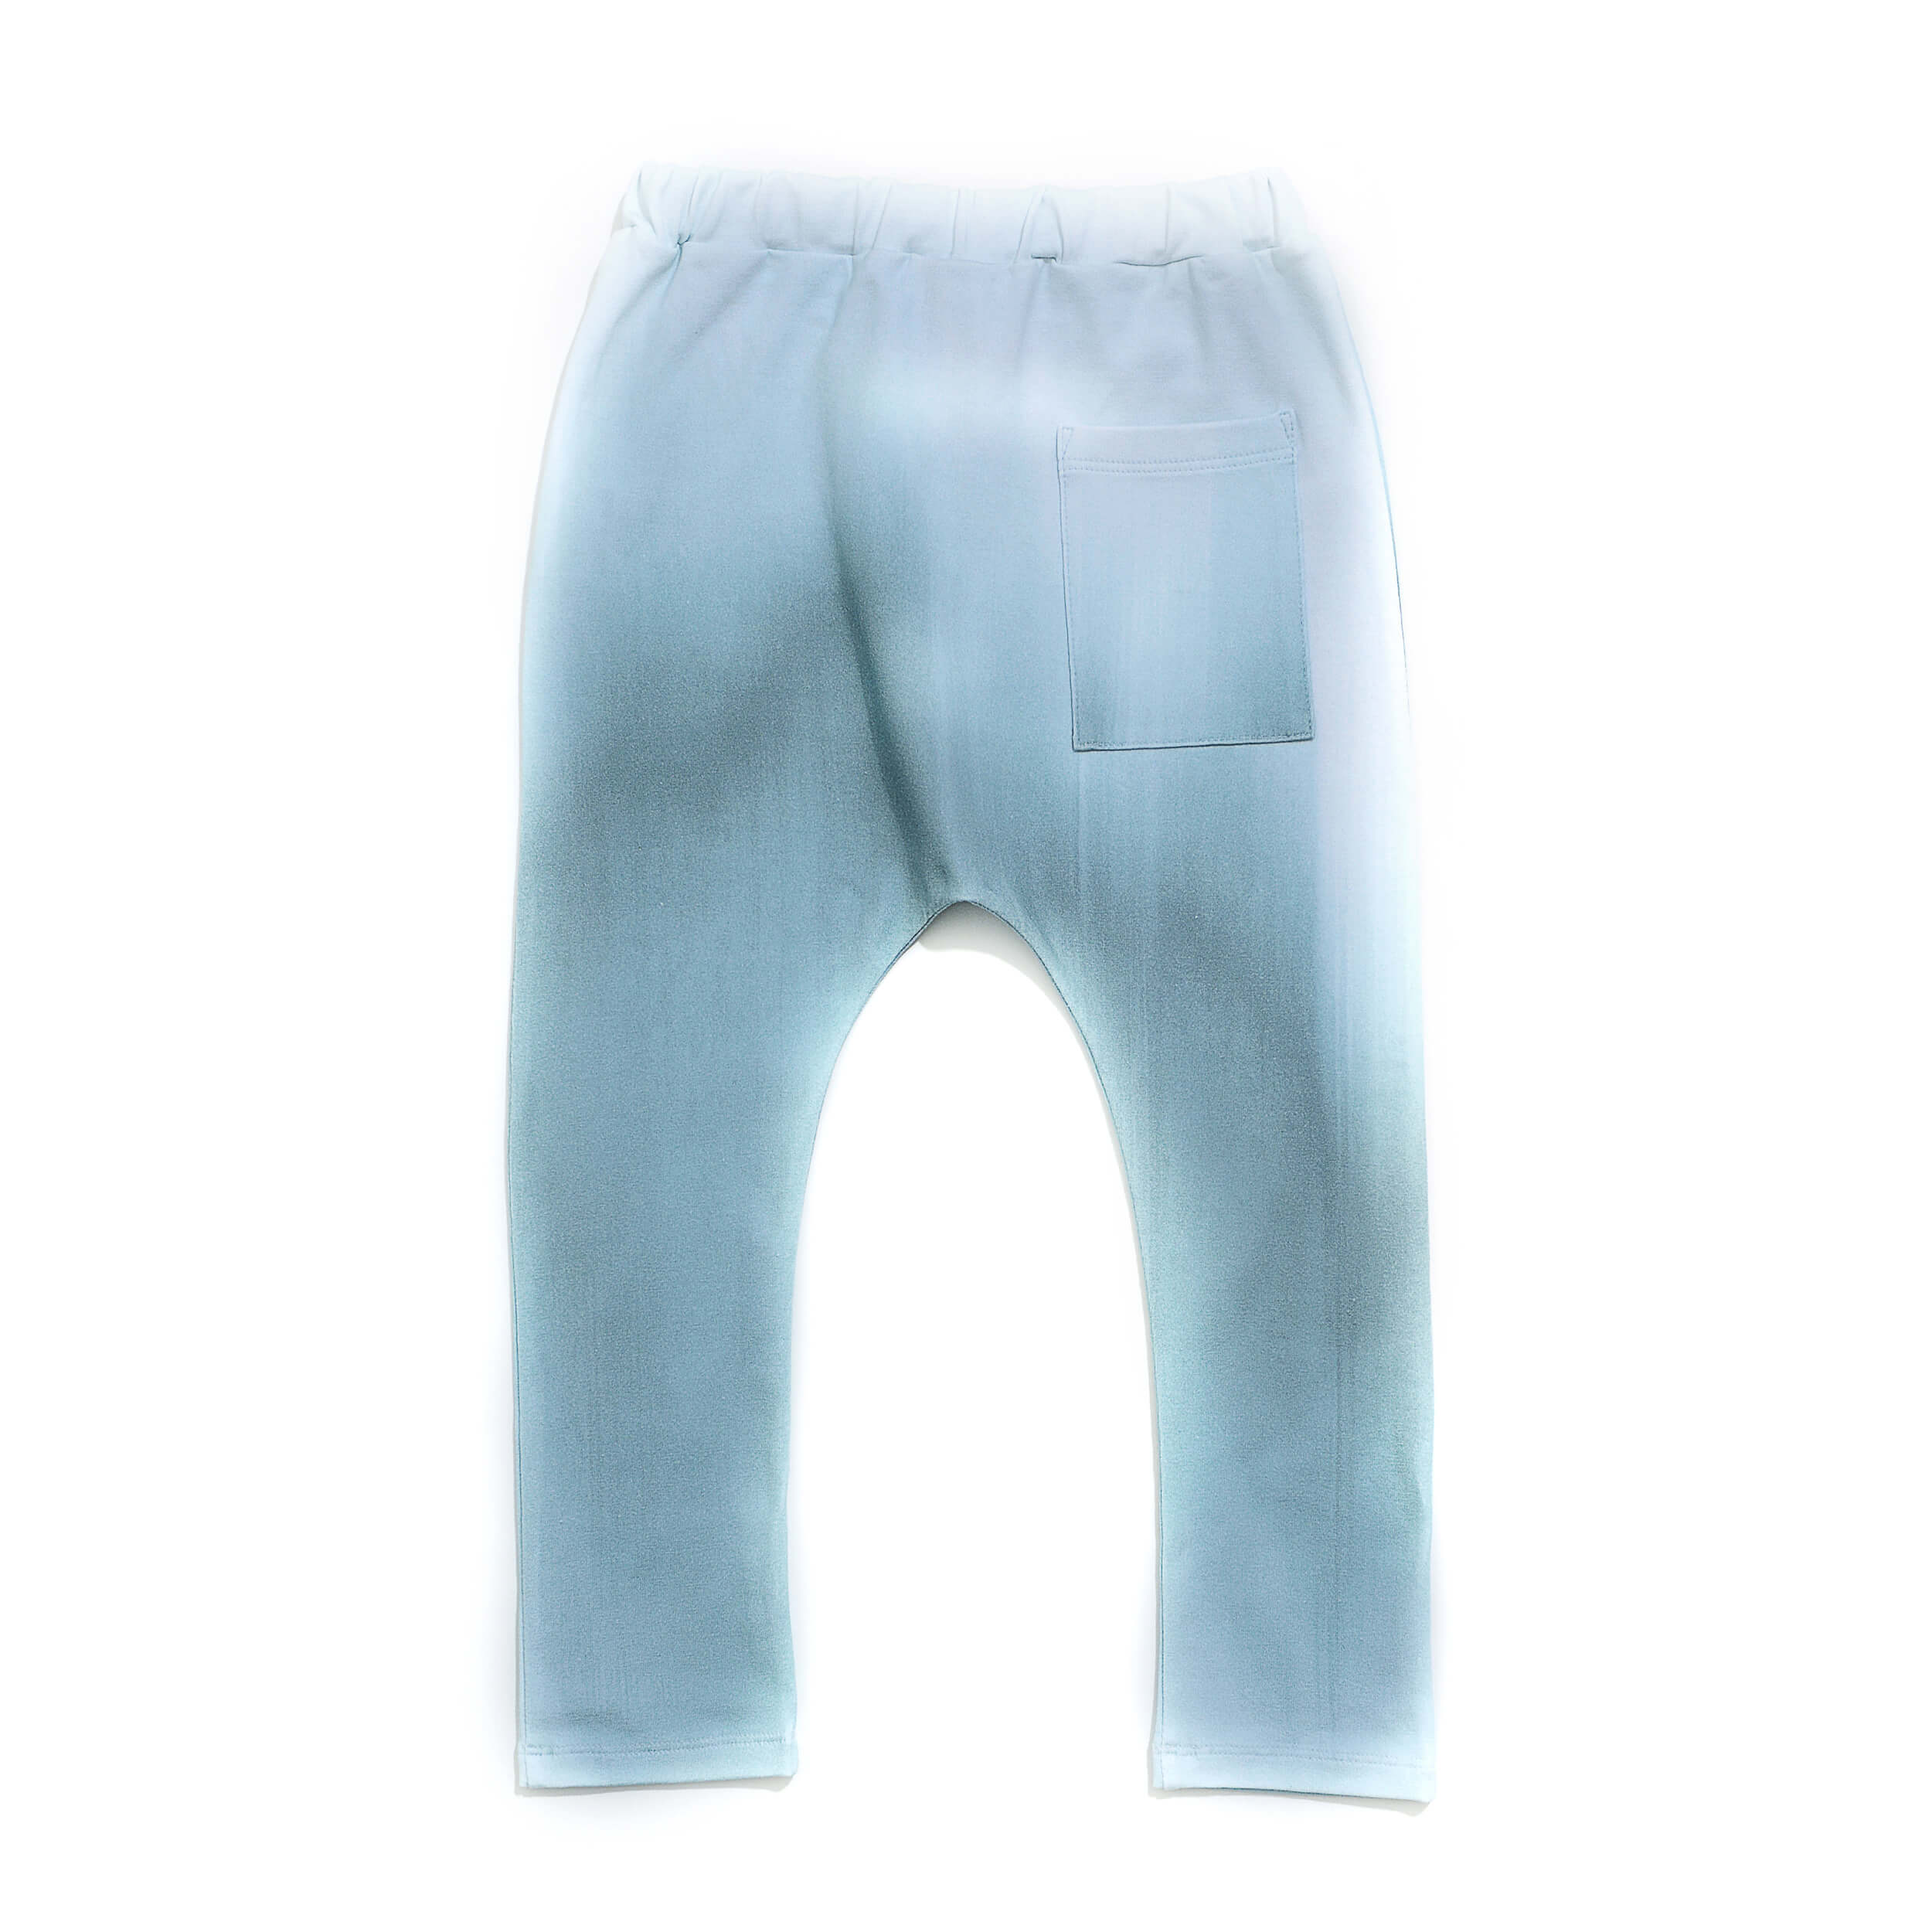 Little Man Happy OMBRE Baggy Pants back